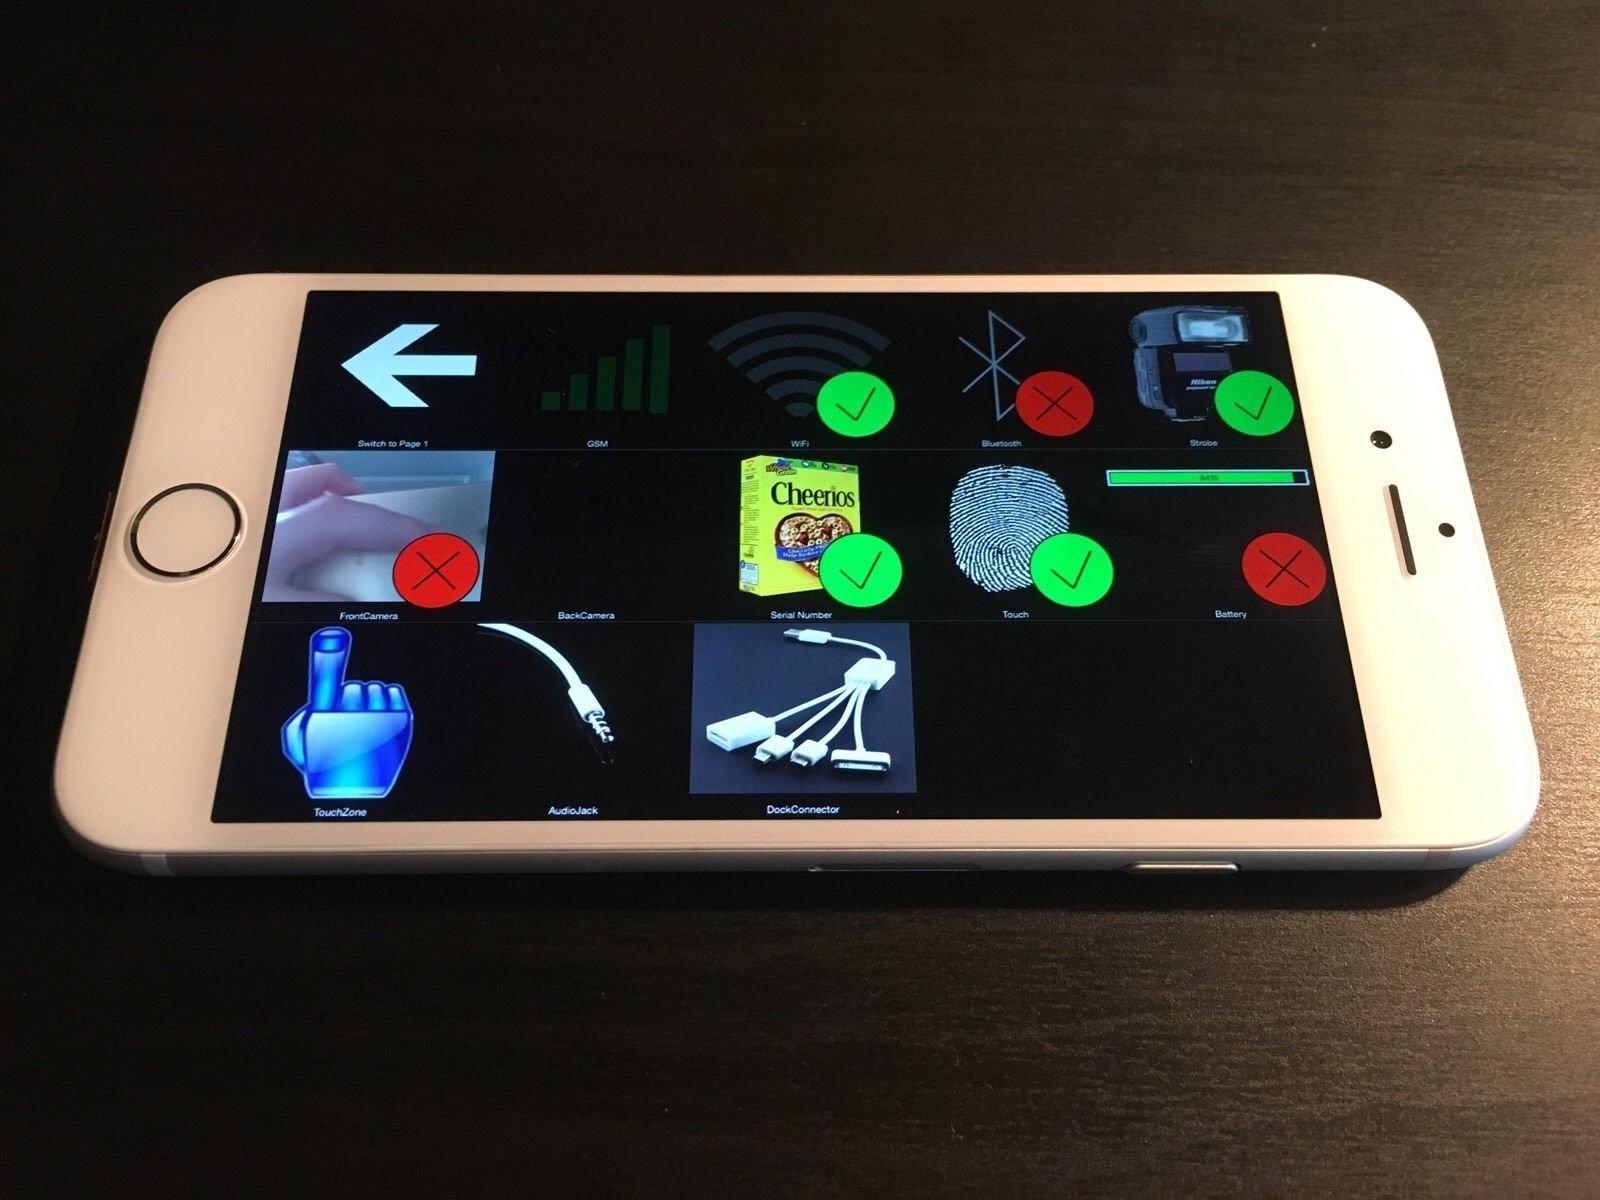 iPhone-6-Prototyp kann bei eBay ersteigert werden